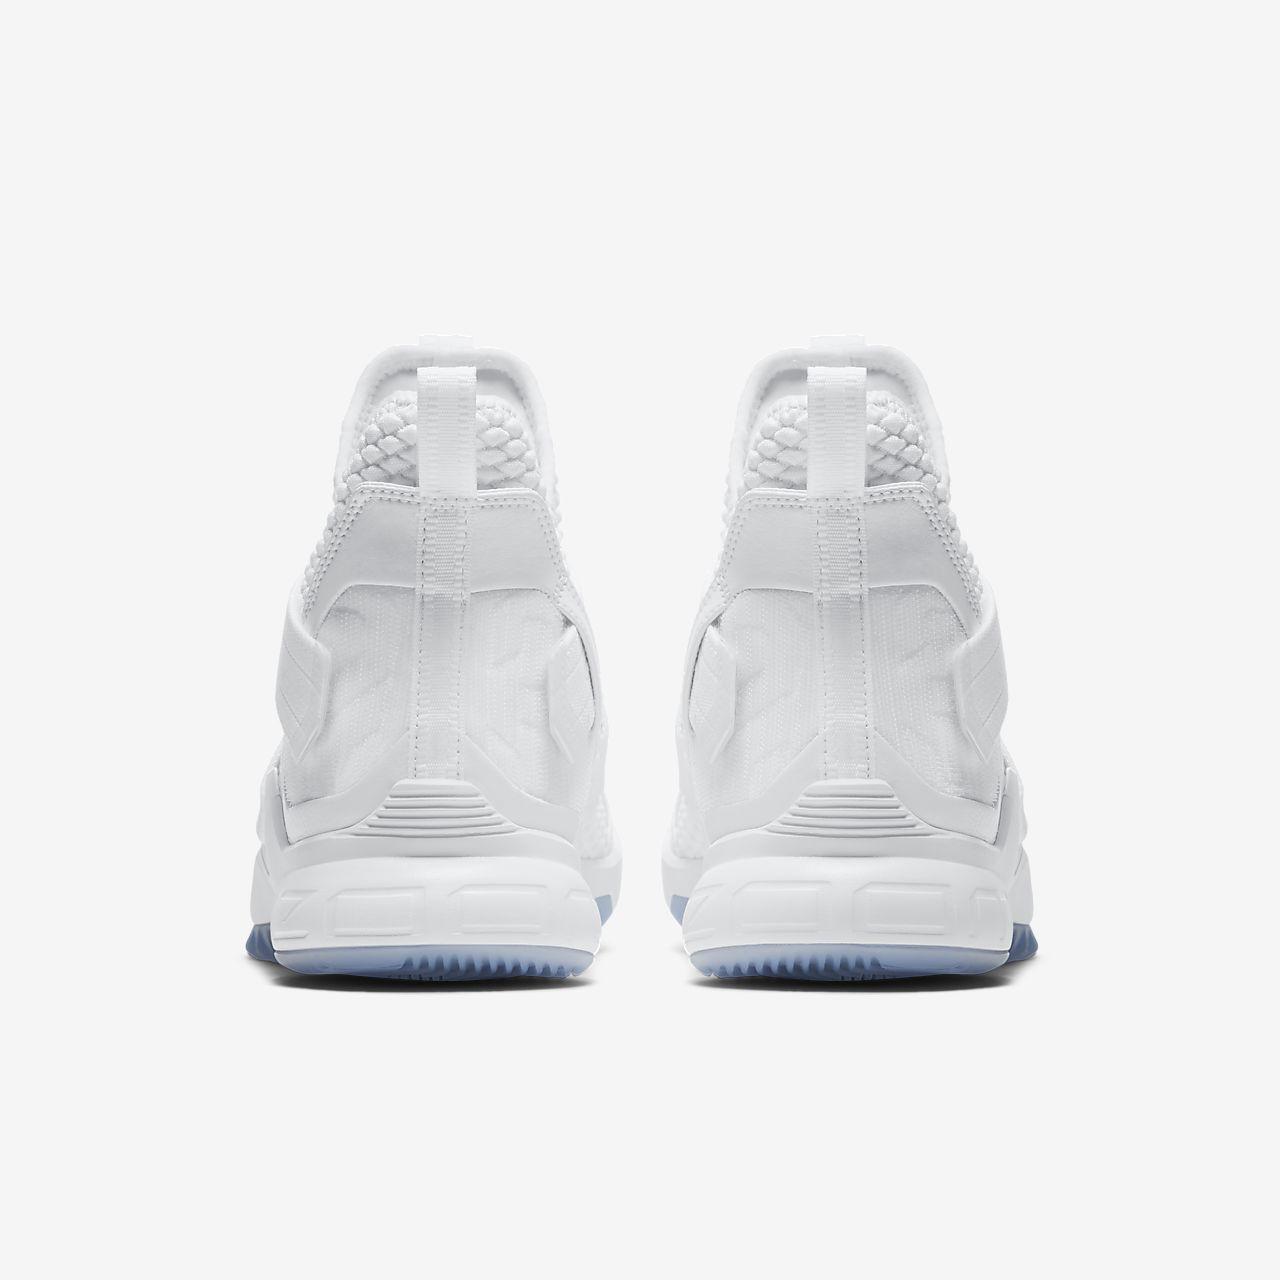 5c4ecb1388a75e LeBron Soldier 12 SFG Basketball Shoe. Nike.com AU